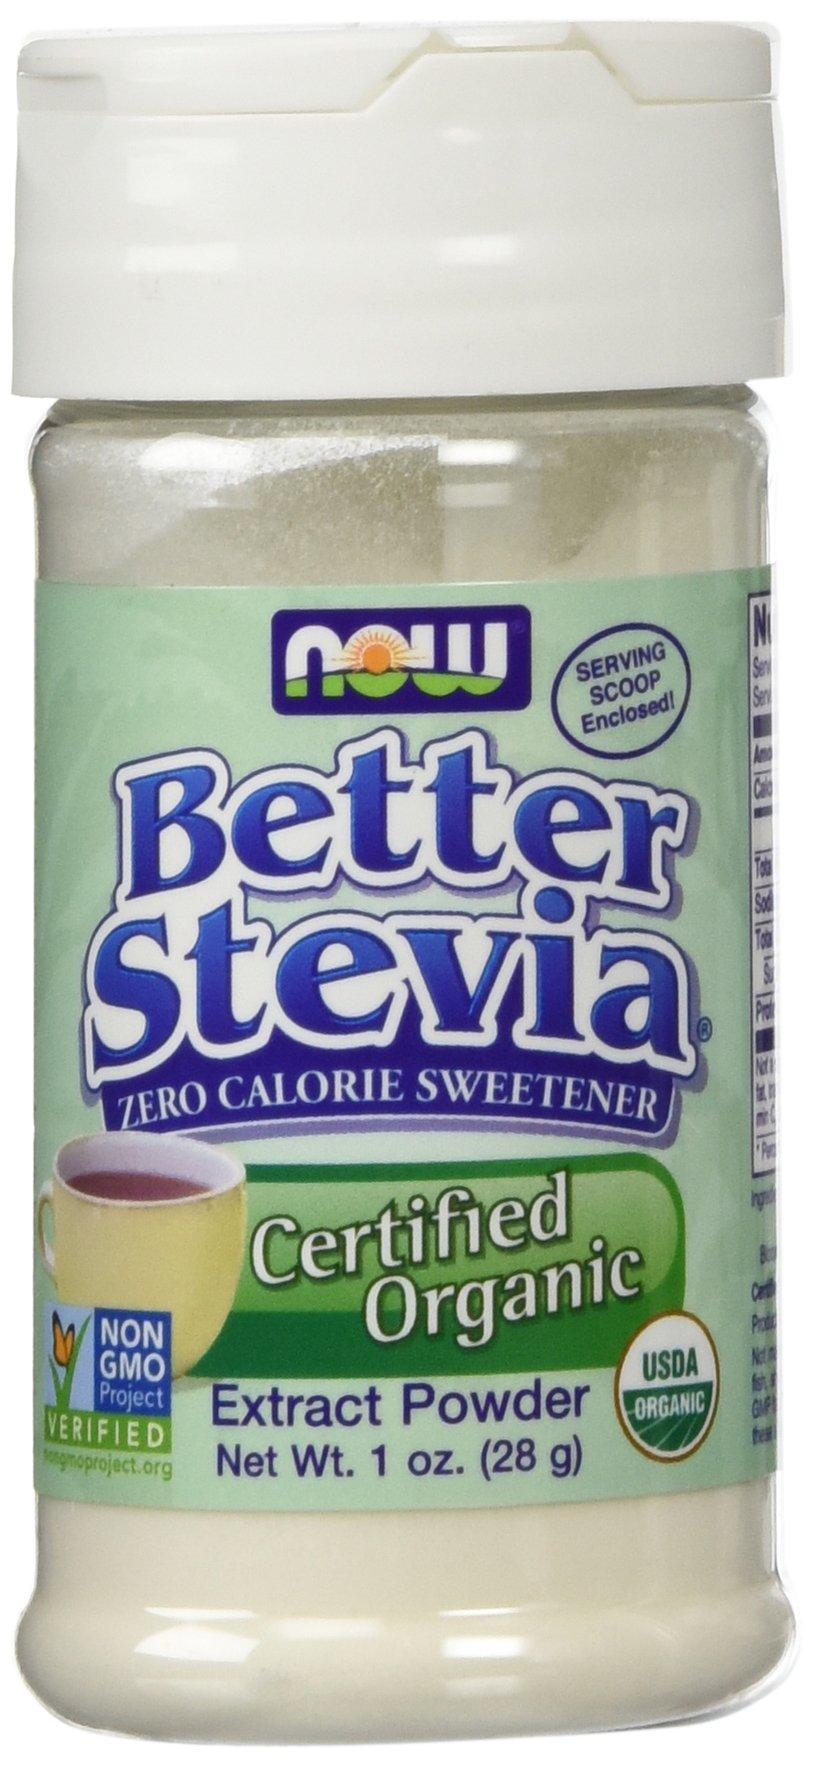 NOW Better Stevia Zero Calorie Sweetener Extract Powder, 1 Oz.